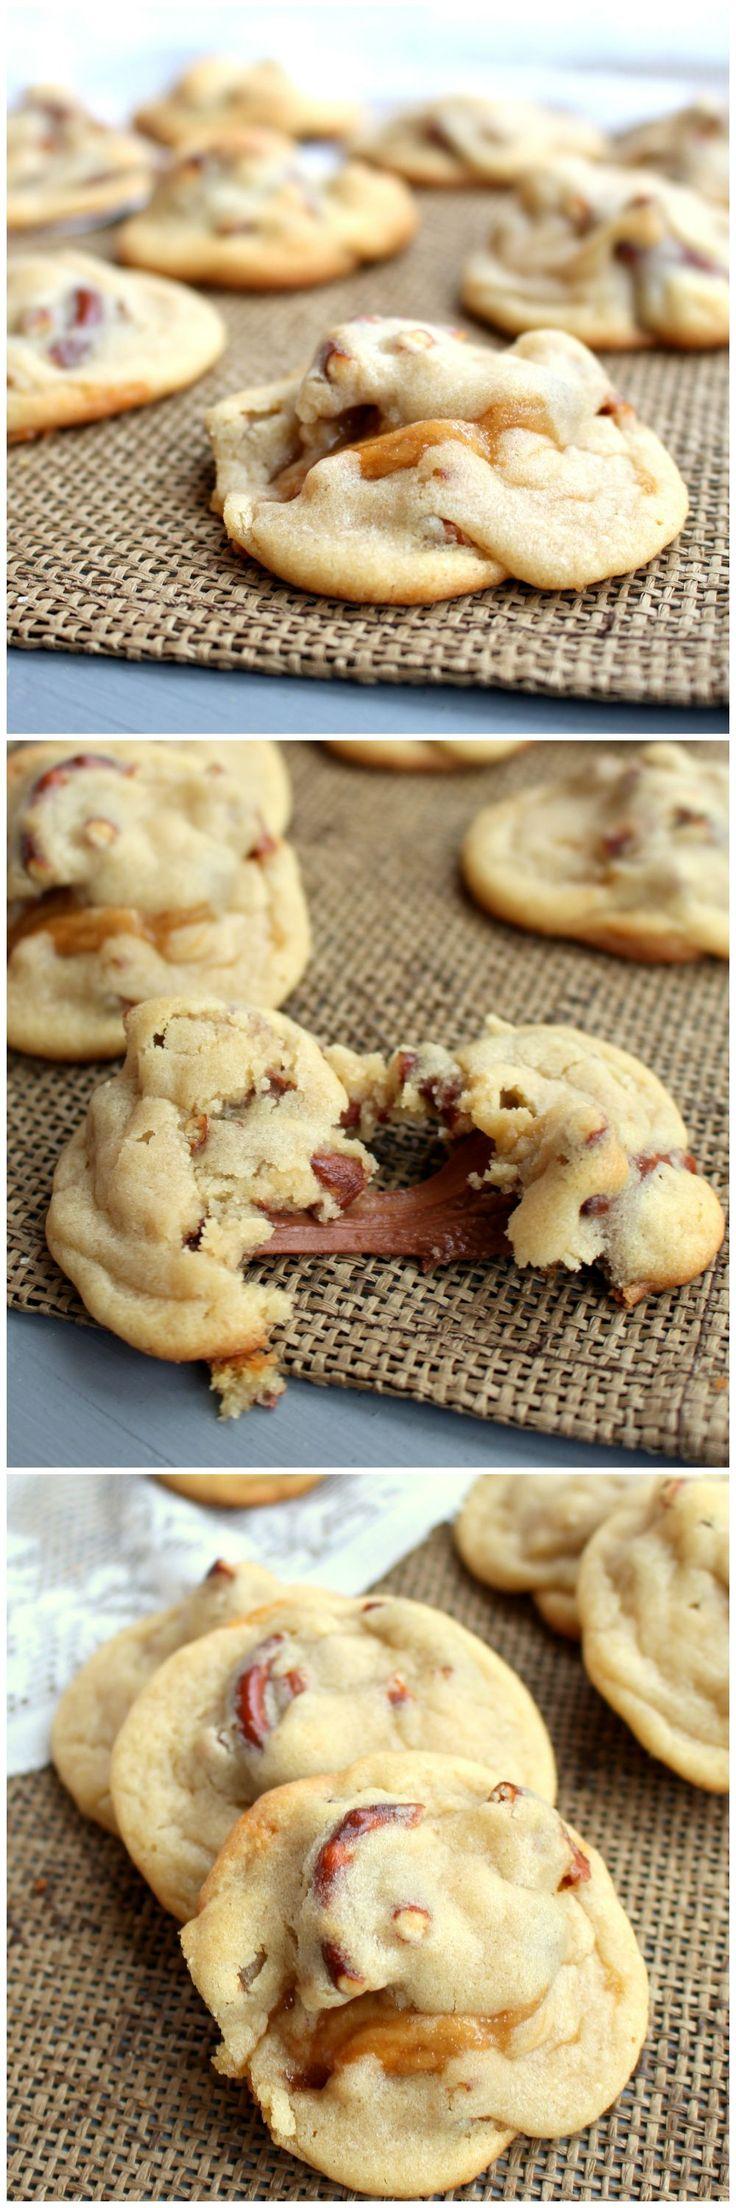 Caramel Stuffed Pretzel Cookies - soft cookies loaded with pretzels and stuffed with caramel!